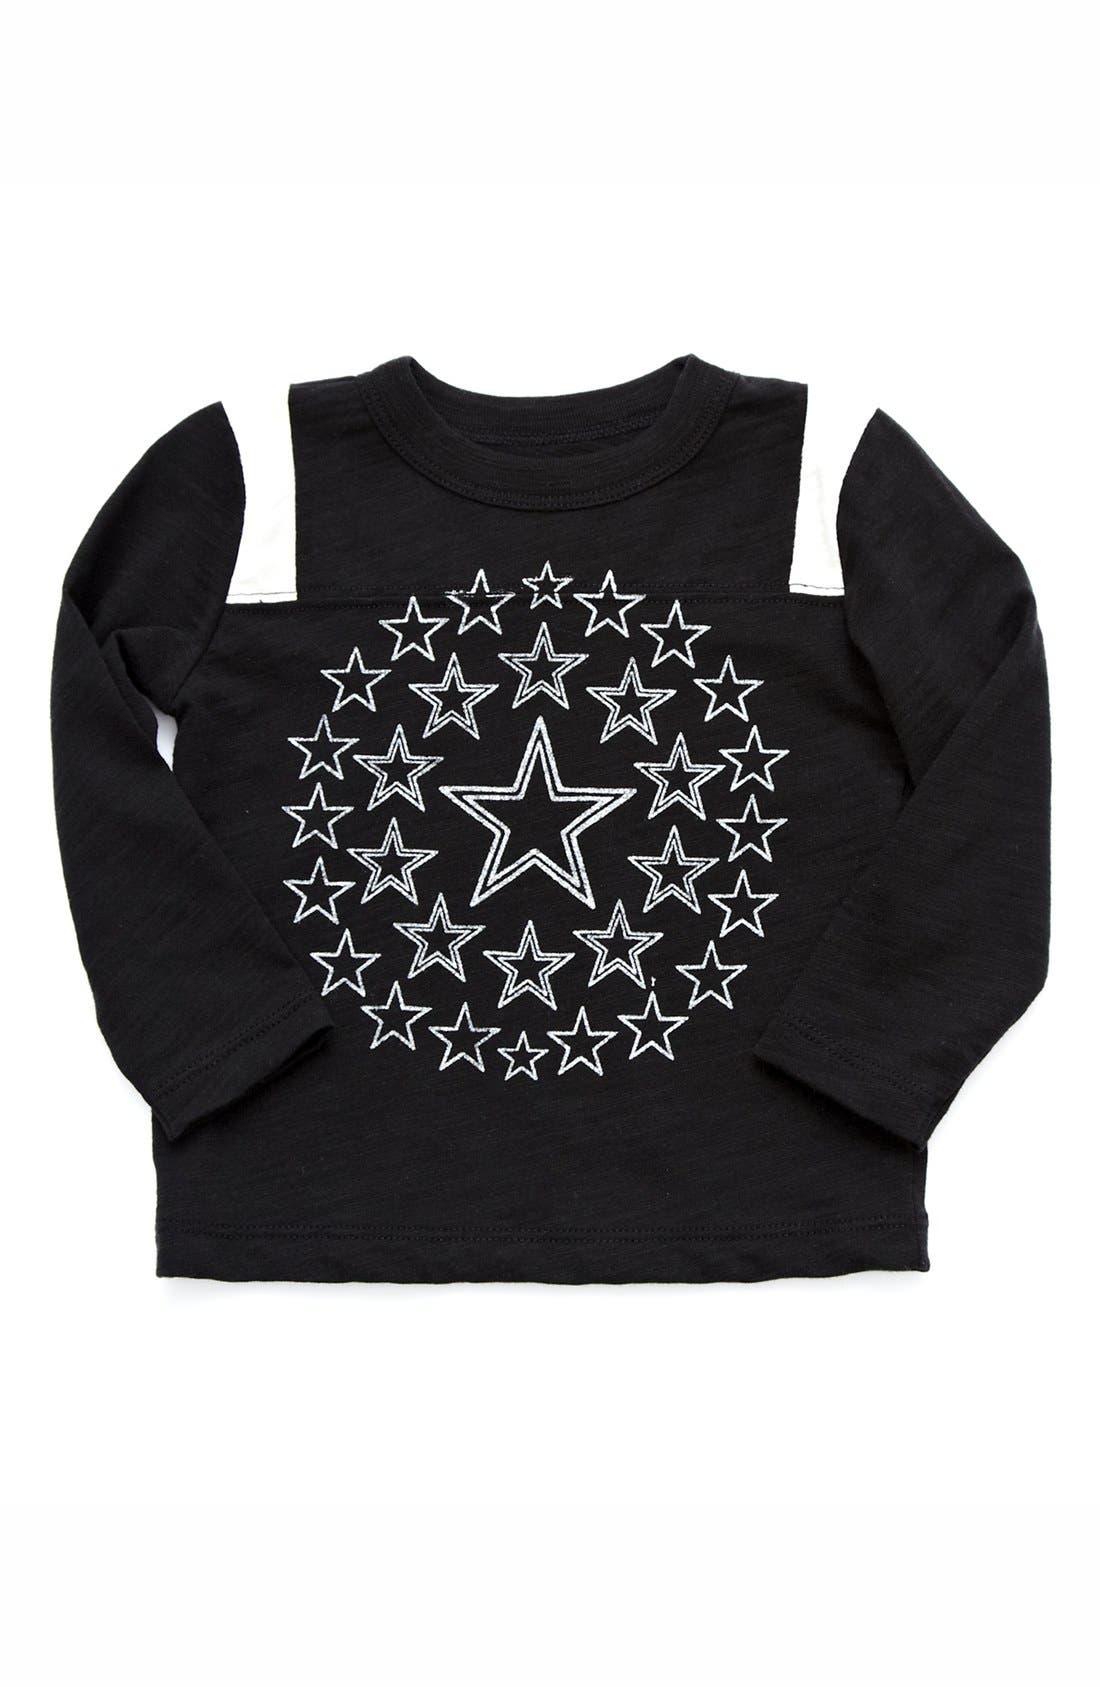 Main Image - Peek 'Stars' Long Sleeve T-Shirt (Baby Boys)